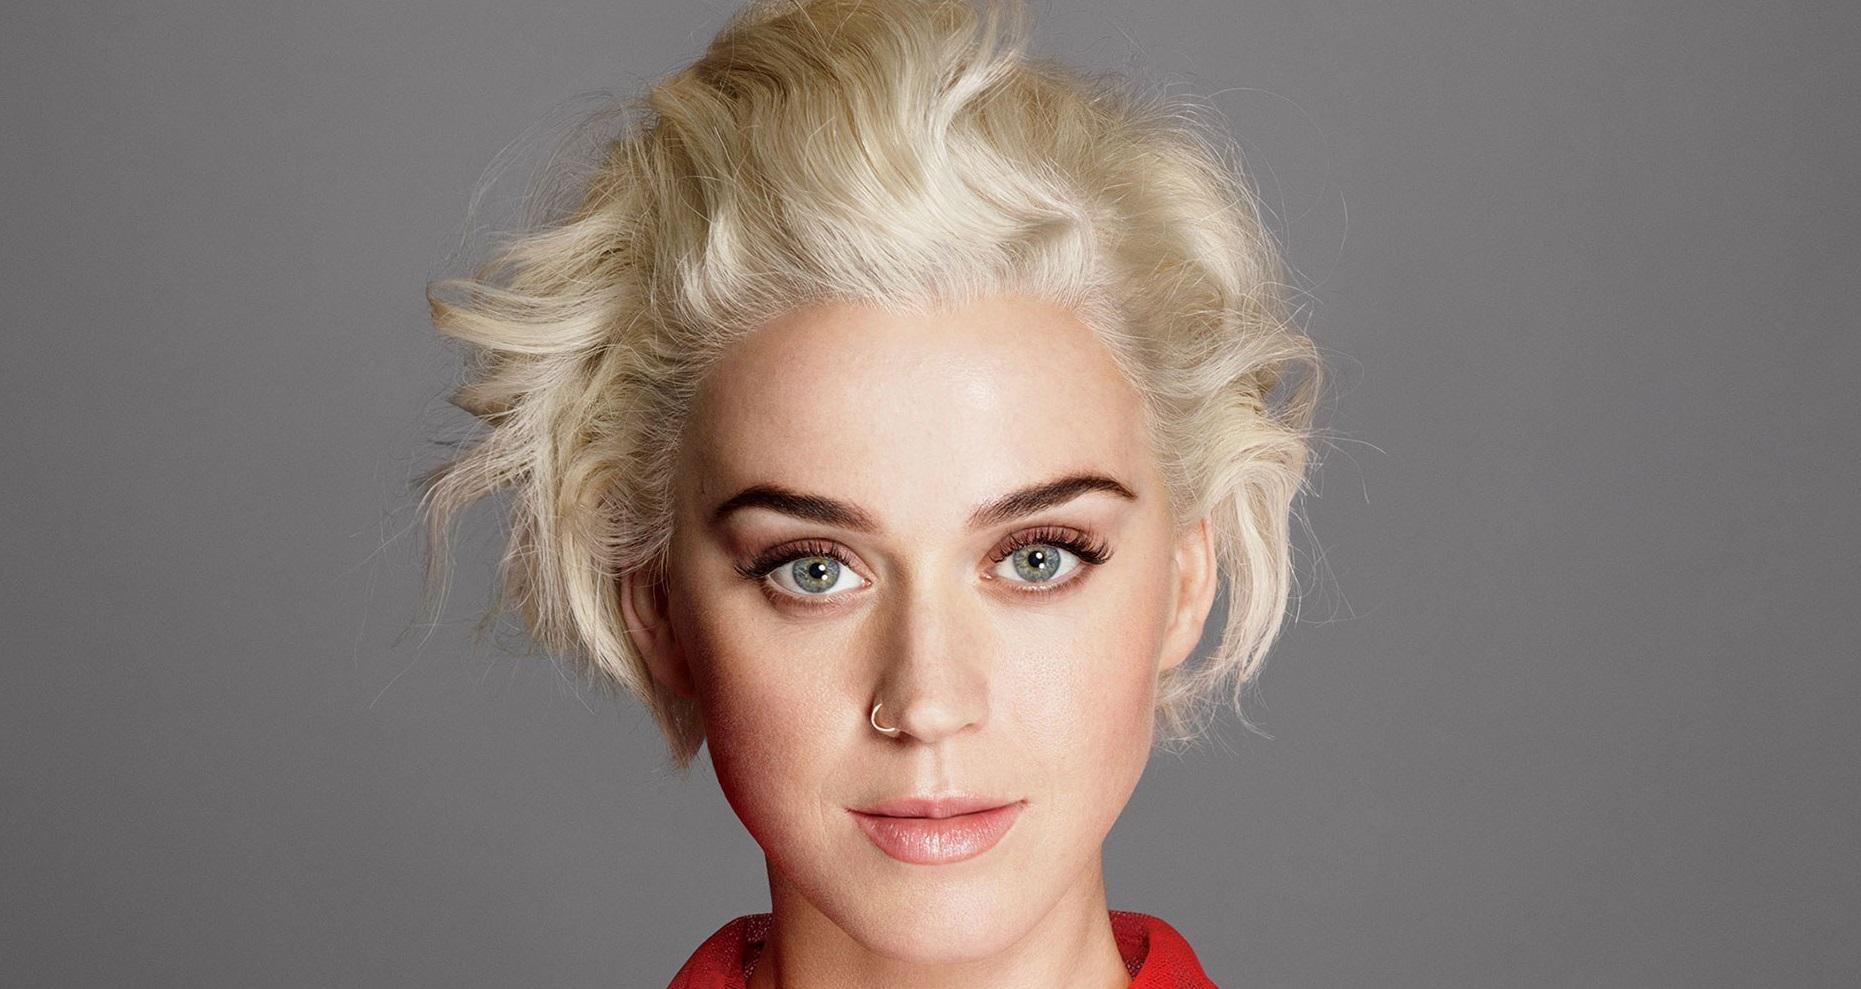 Em entrevista MARAVILHOSA, Katy Perry fala sobre nova fase na música, política, Beyoncé, Adele e Grammy